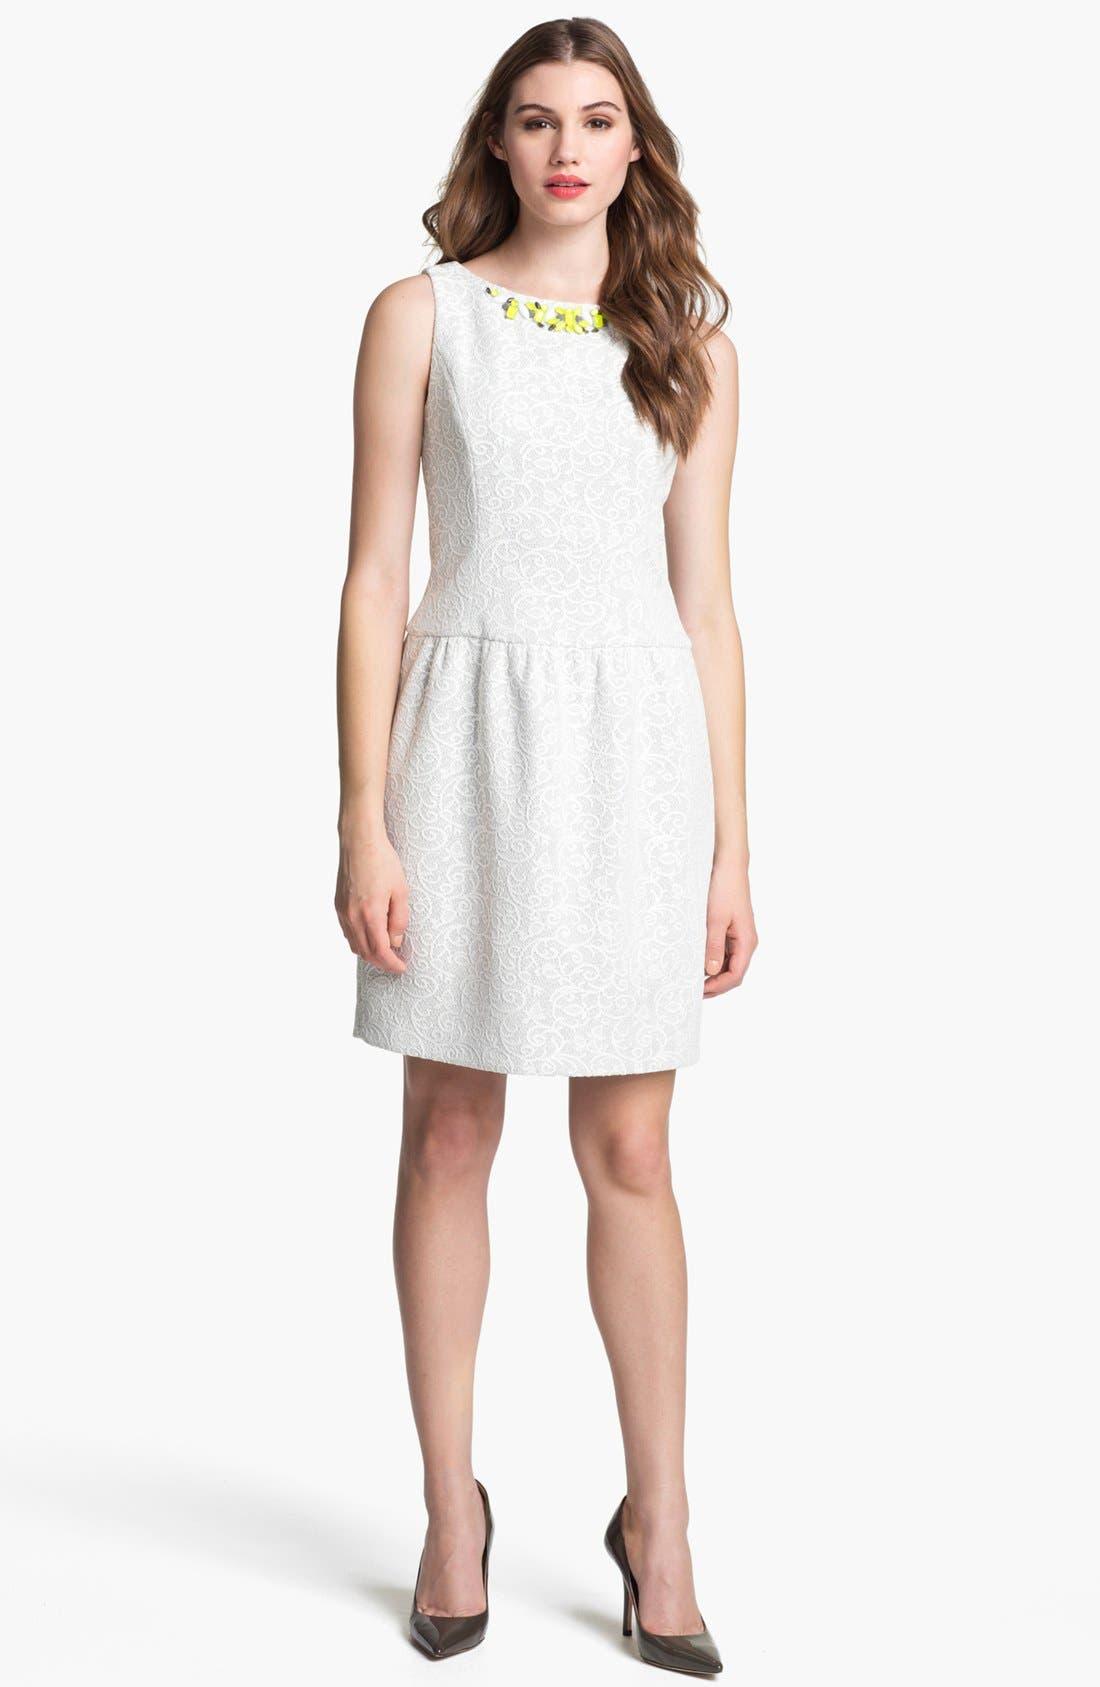 Alternate Image 1 Selected - Ivy & Blu Embellished Knit Lace Dress